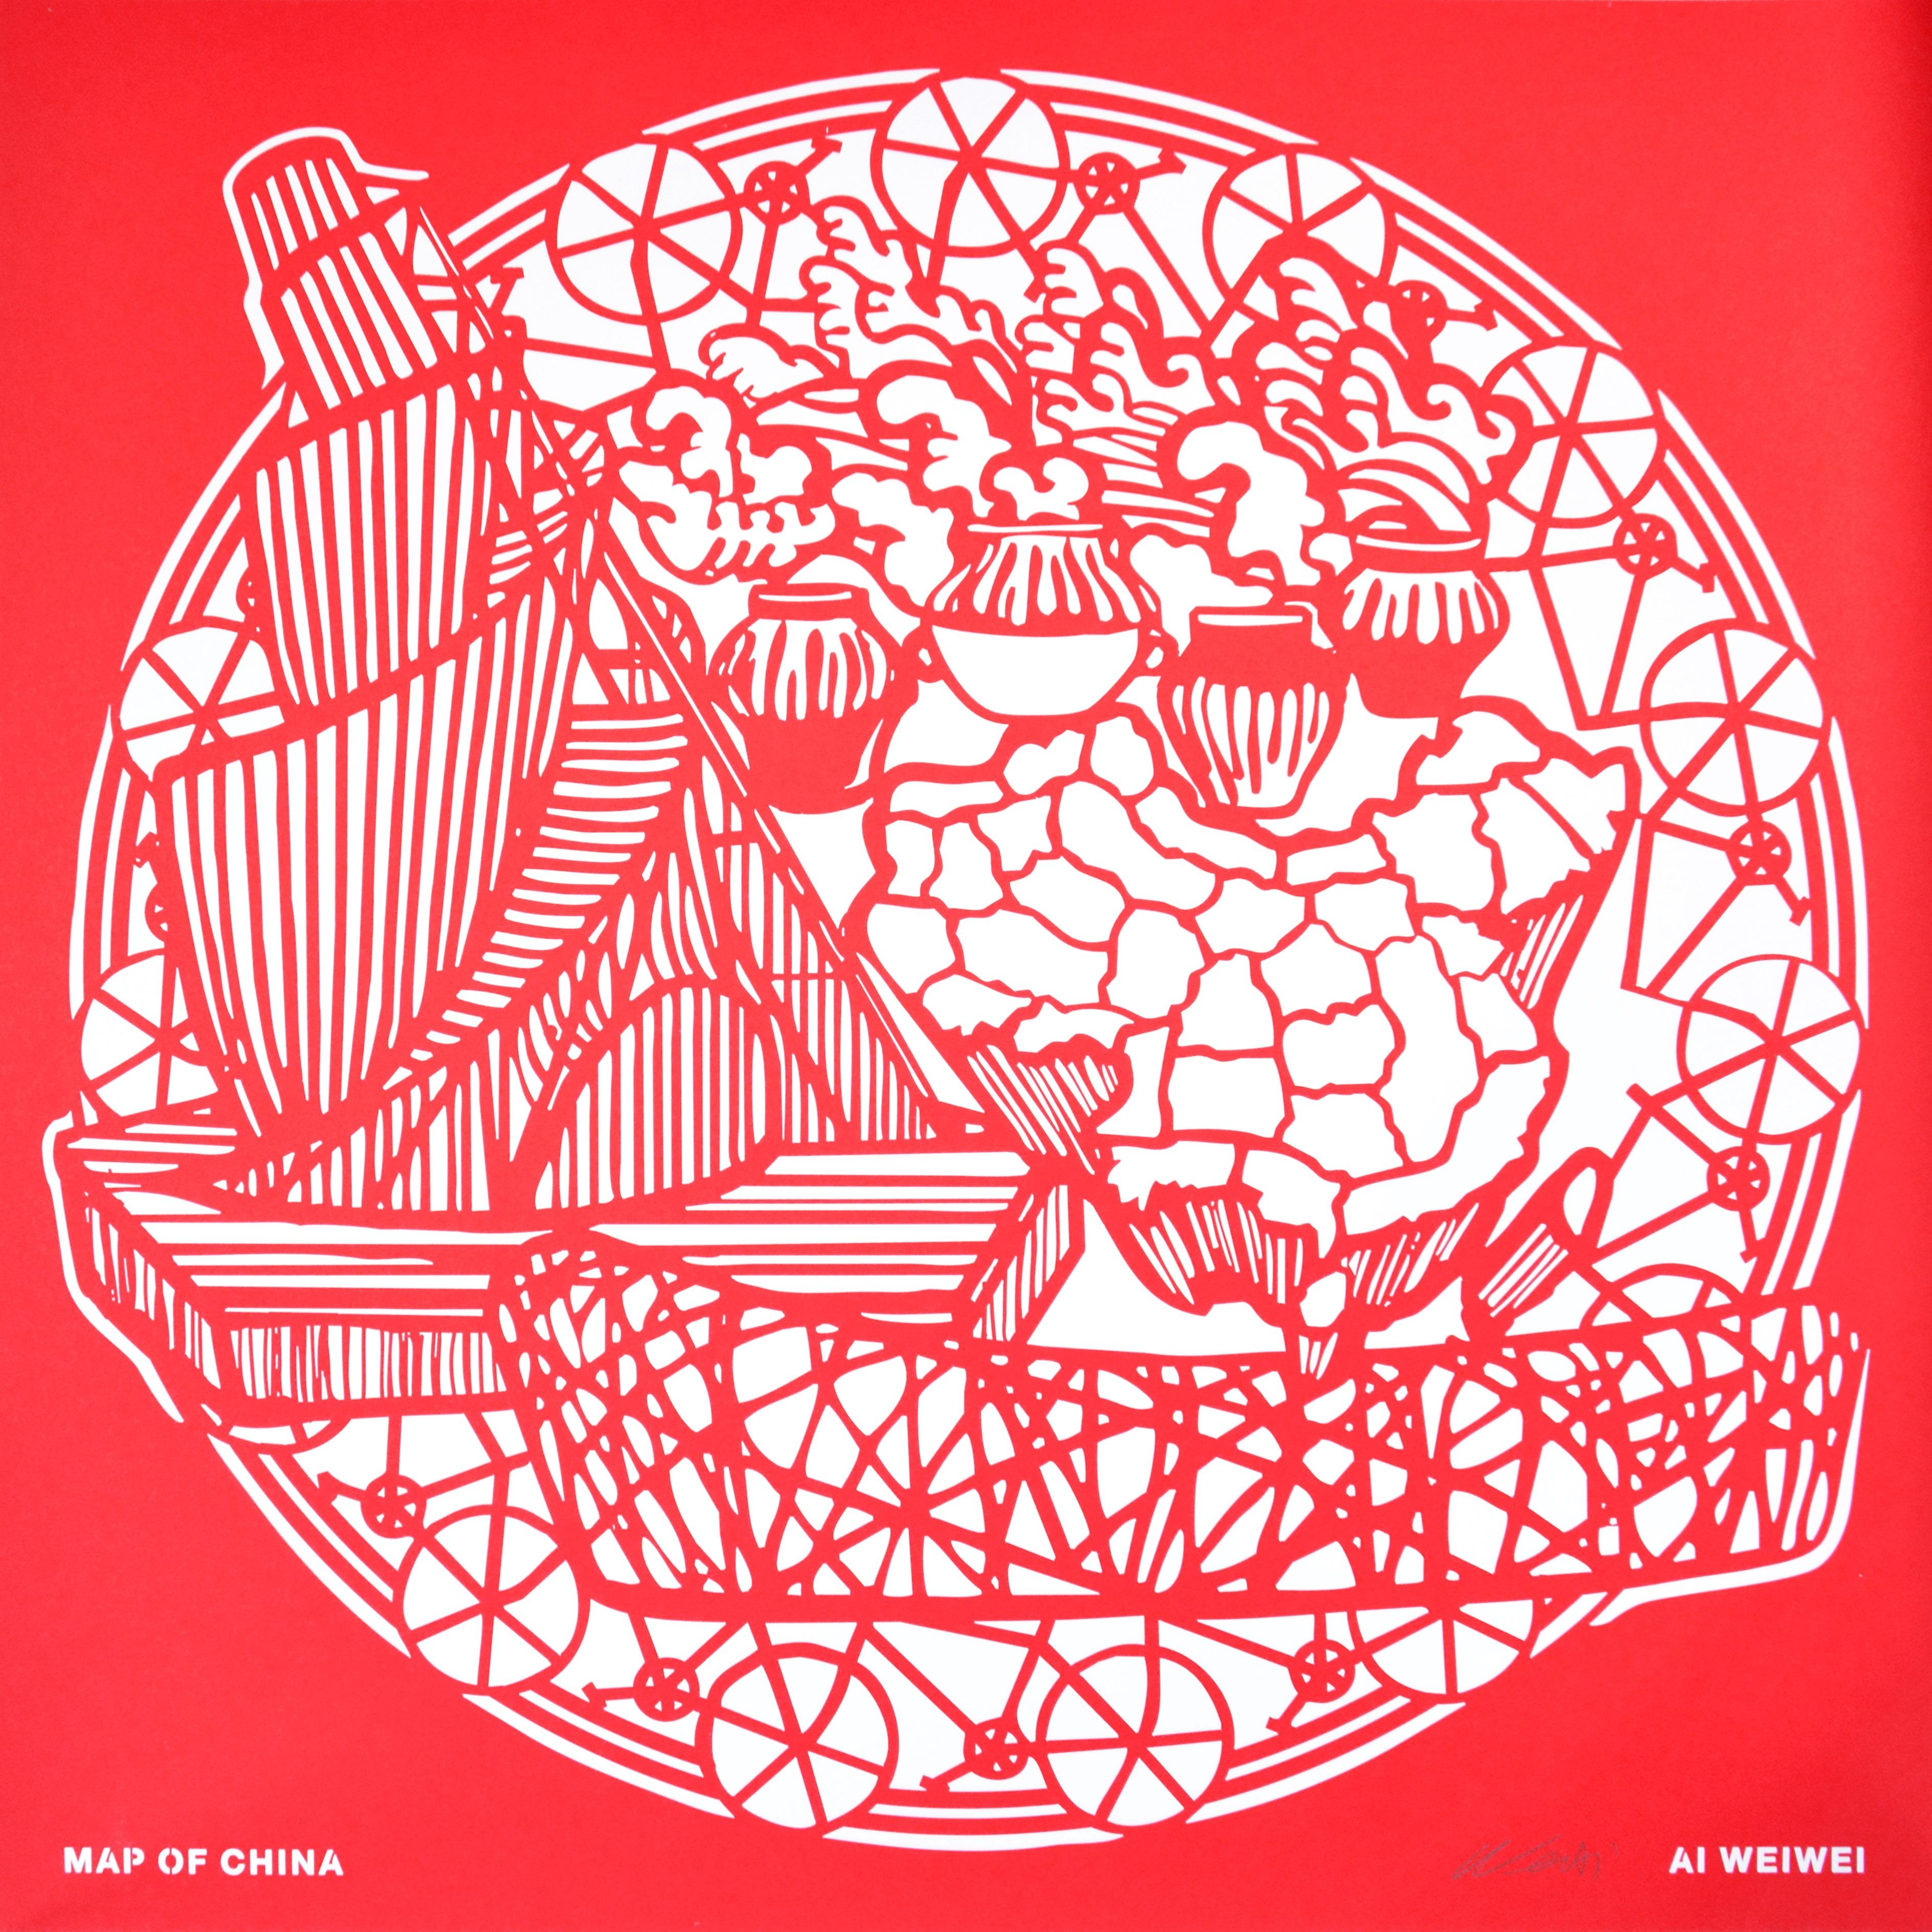 Ai Weiwei, Map of China, from the Papercut Portfolio, 2019